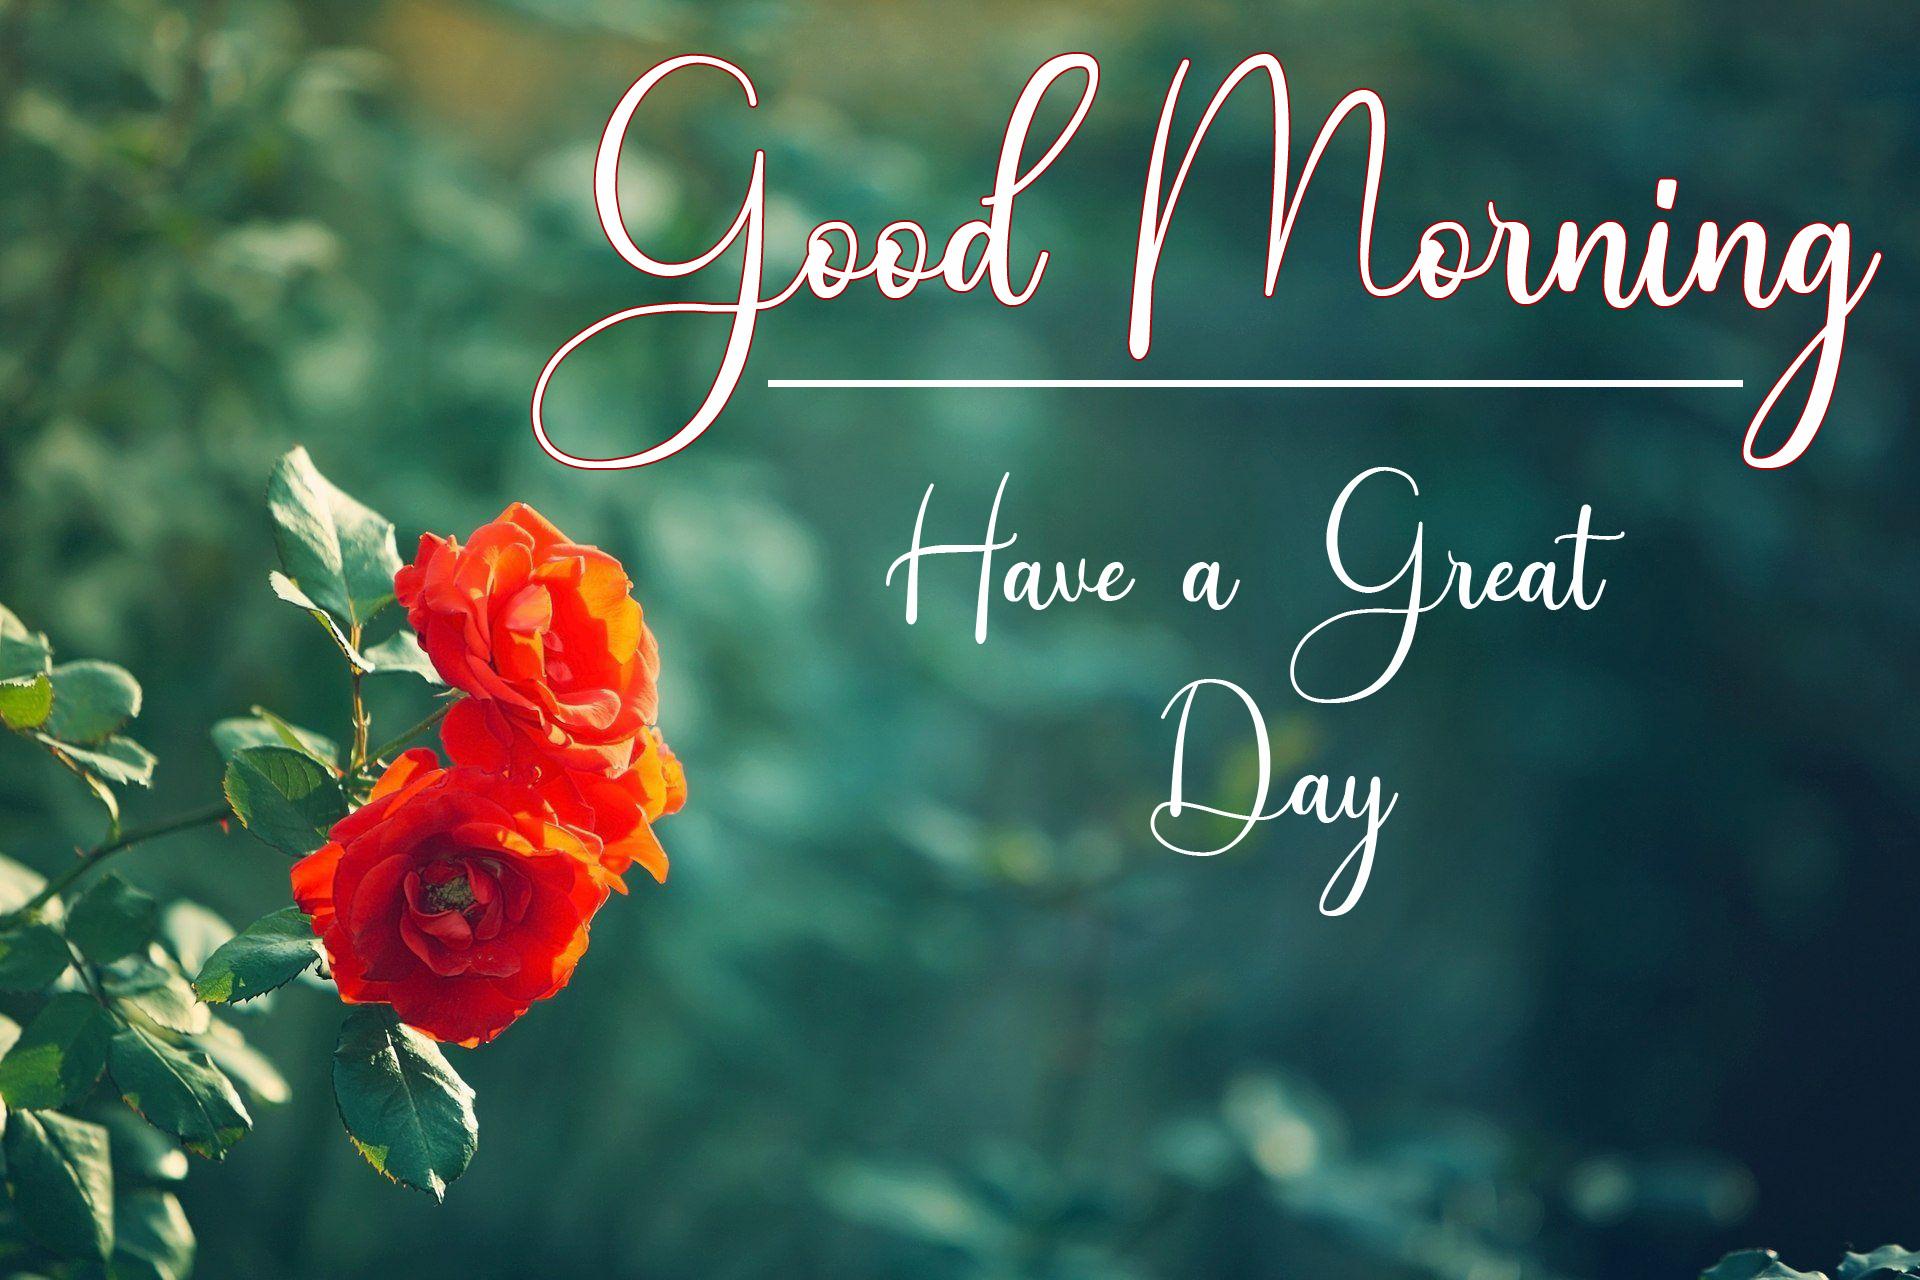 Good Morning Wallpaper Free New Download